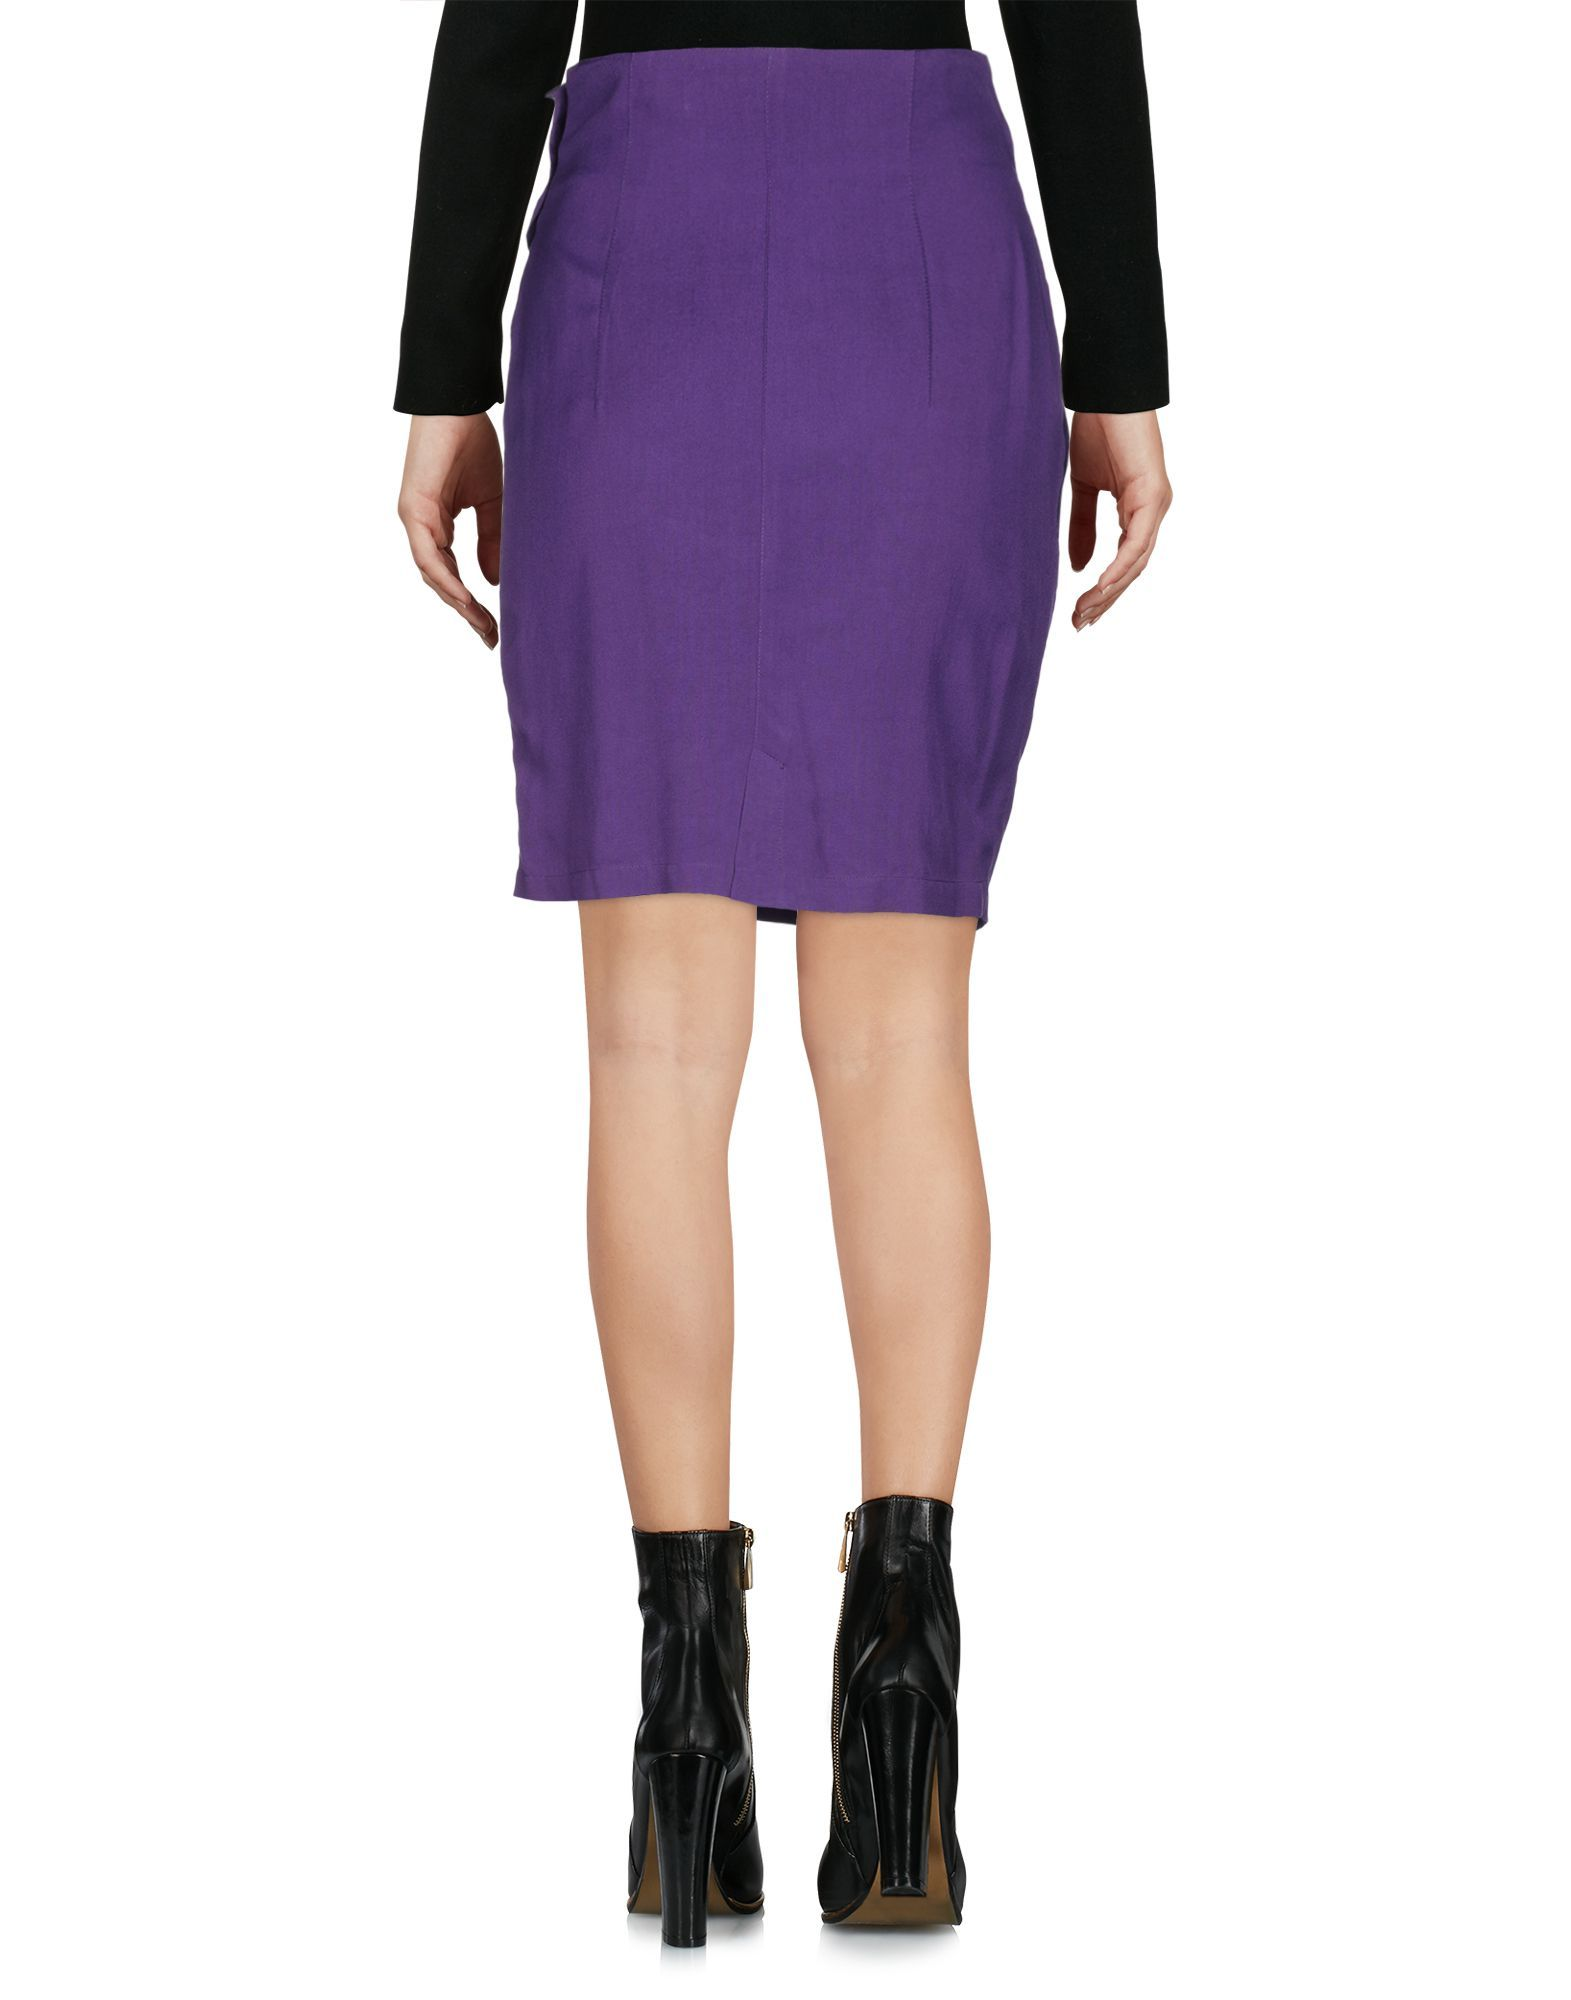 Versus Versace Purple Short Skirt